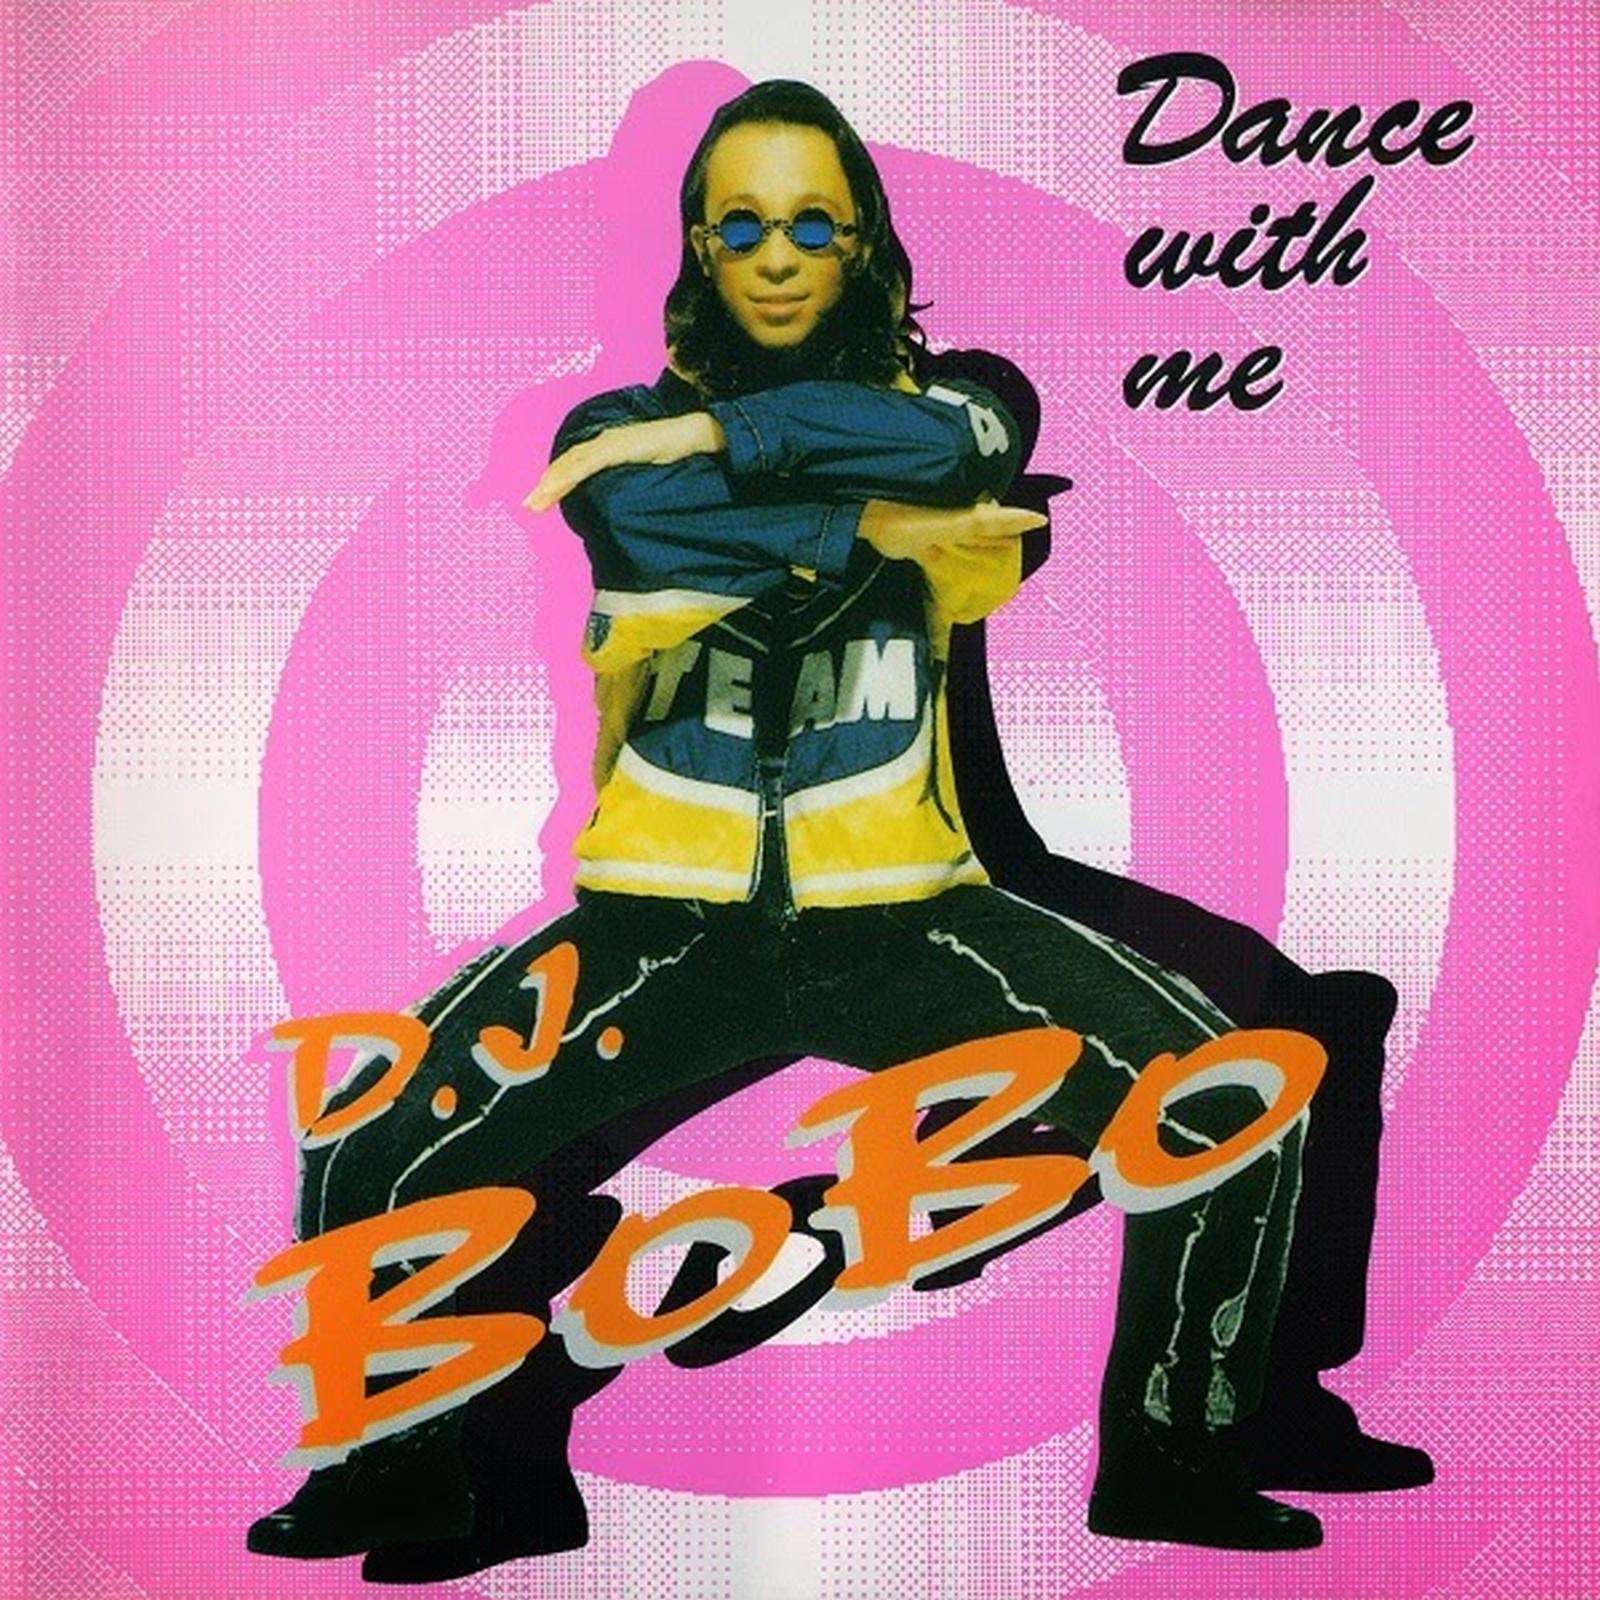 dance vs house dj bobo dance with me cd album 1993. Black Bedroom Furniture Sets. Home Design Ideas